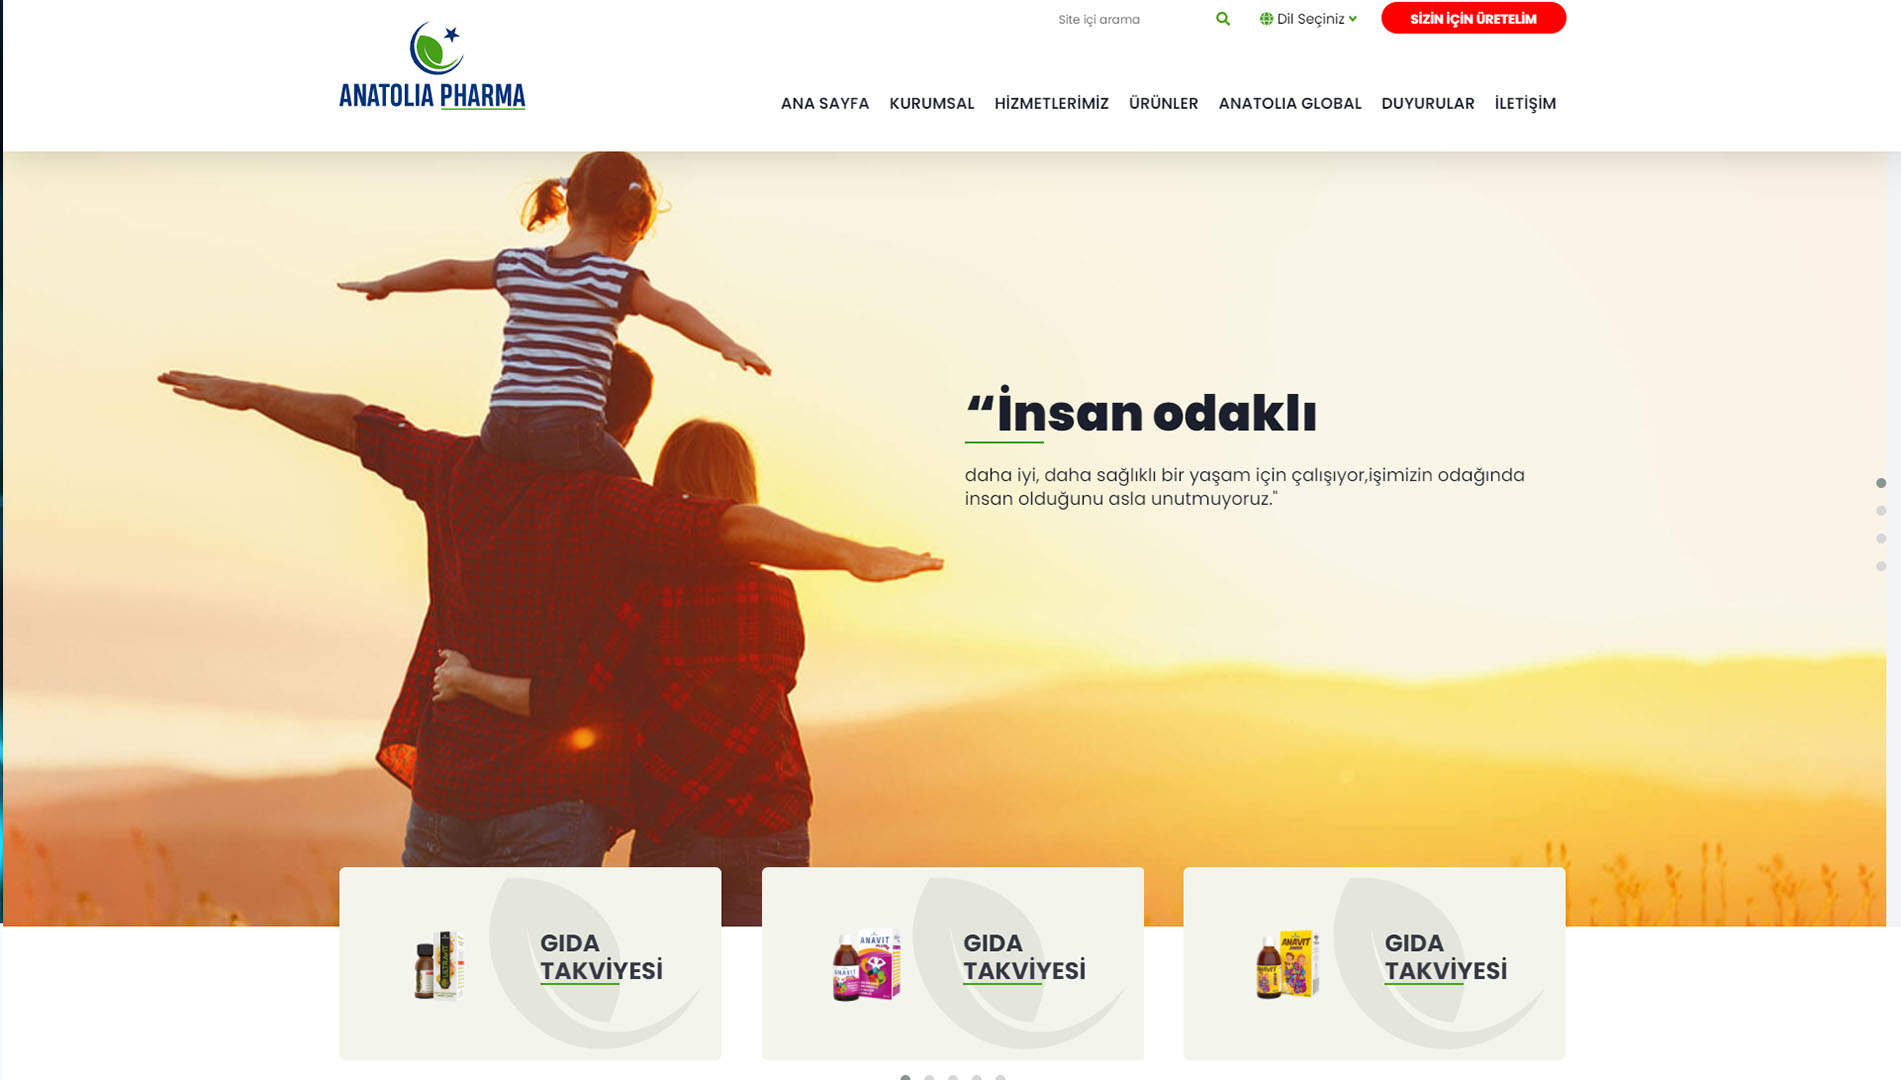 Anatolia Pharma